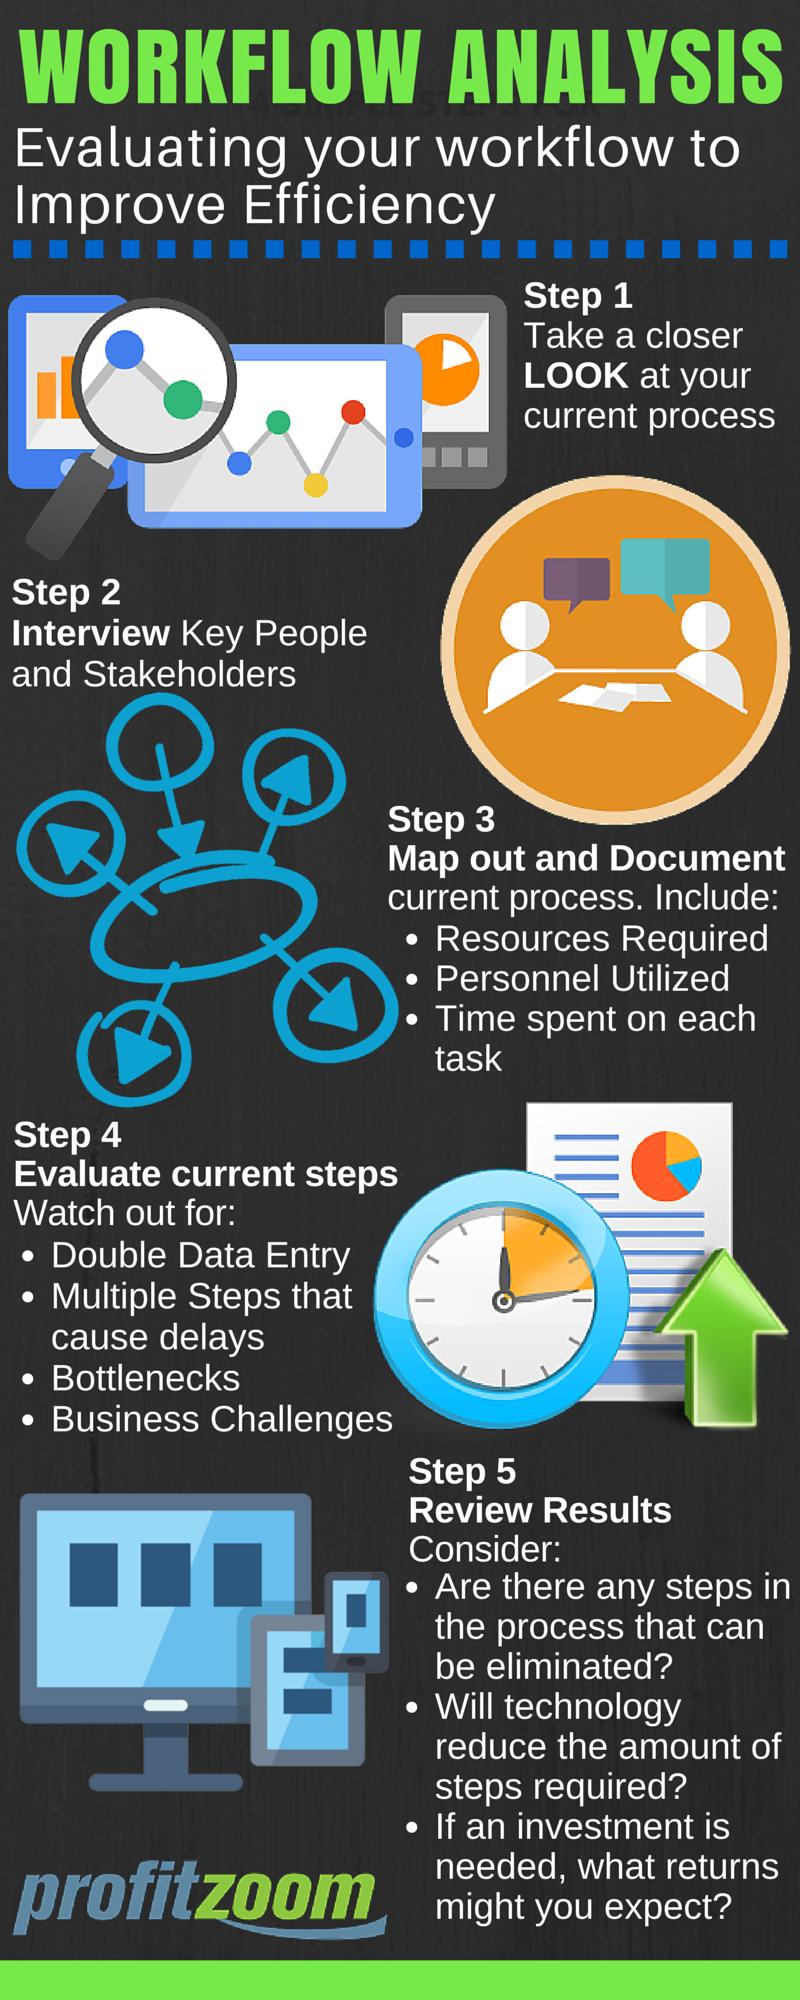 5 Steps to Workflow Analysis